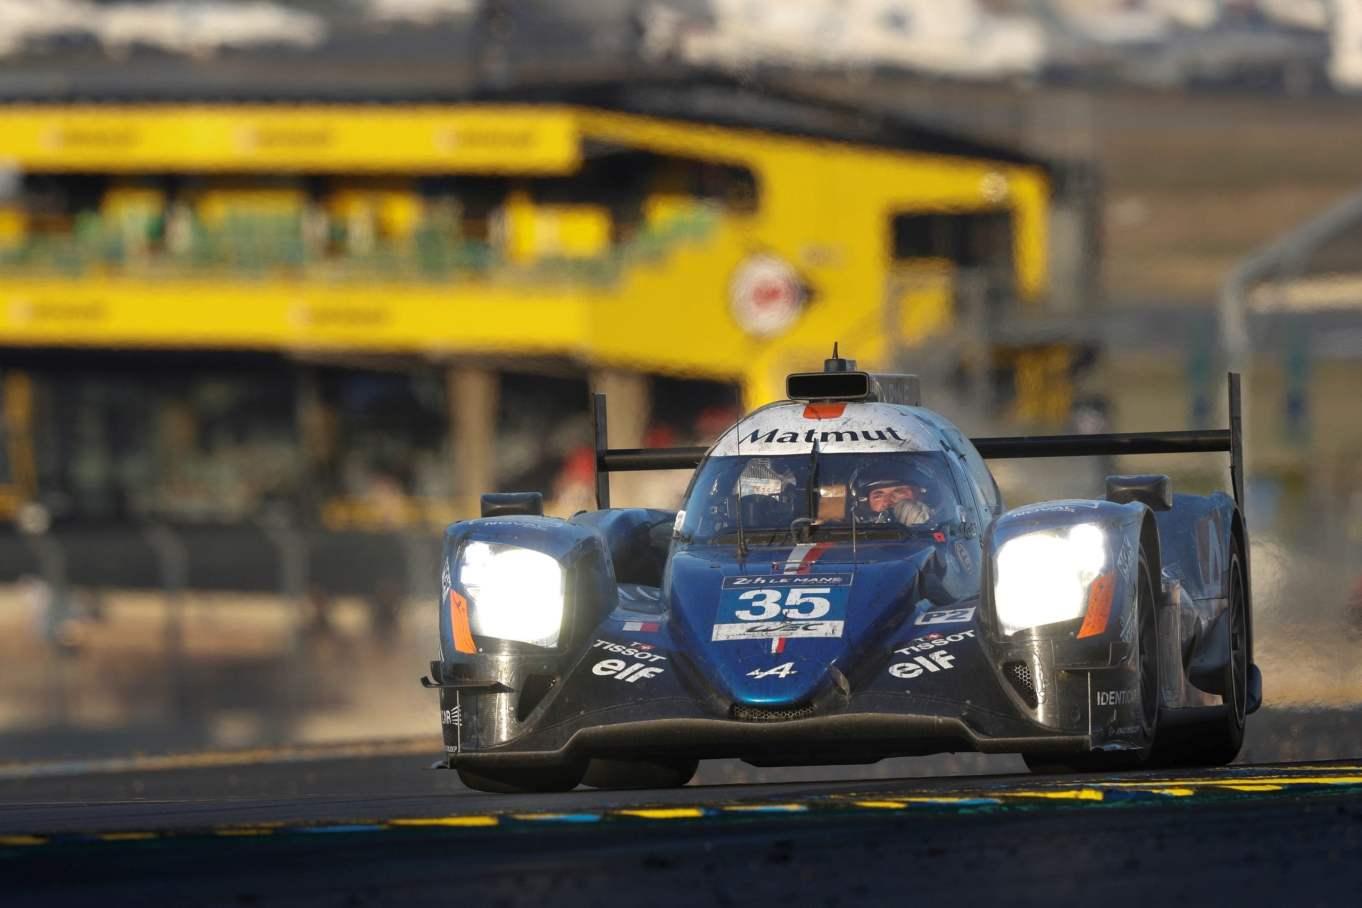 Alpine A470 24 Heures du Mans 2017 Signatech Matmut Endurance WEC Panciatici Ragues Menezes Rao Negrao Dumas (1)